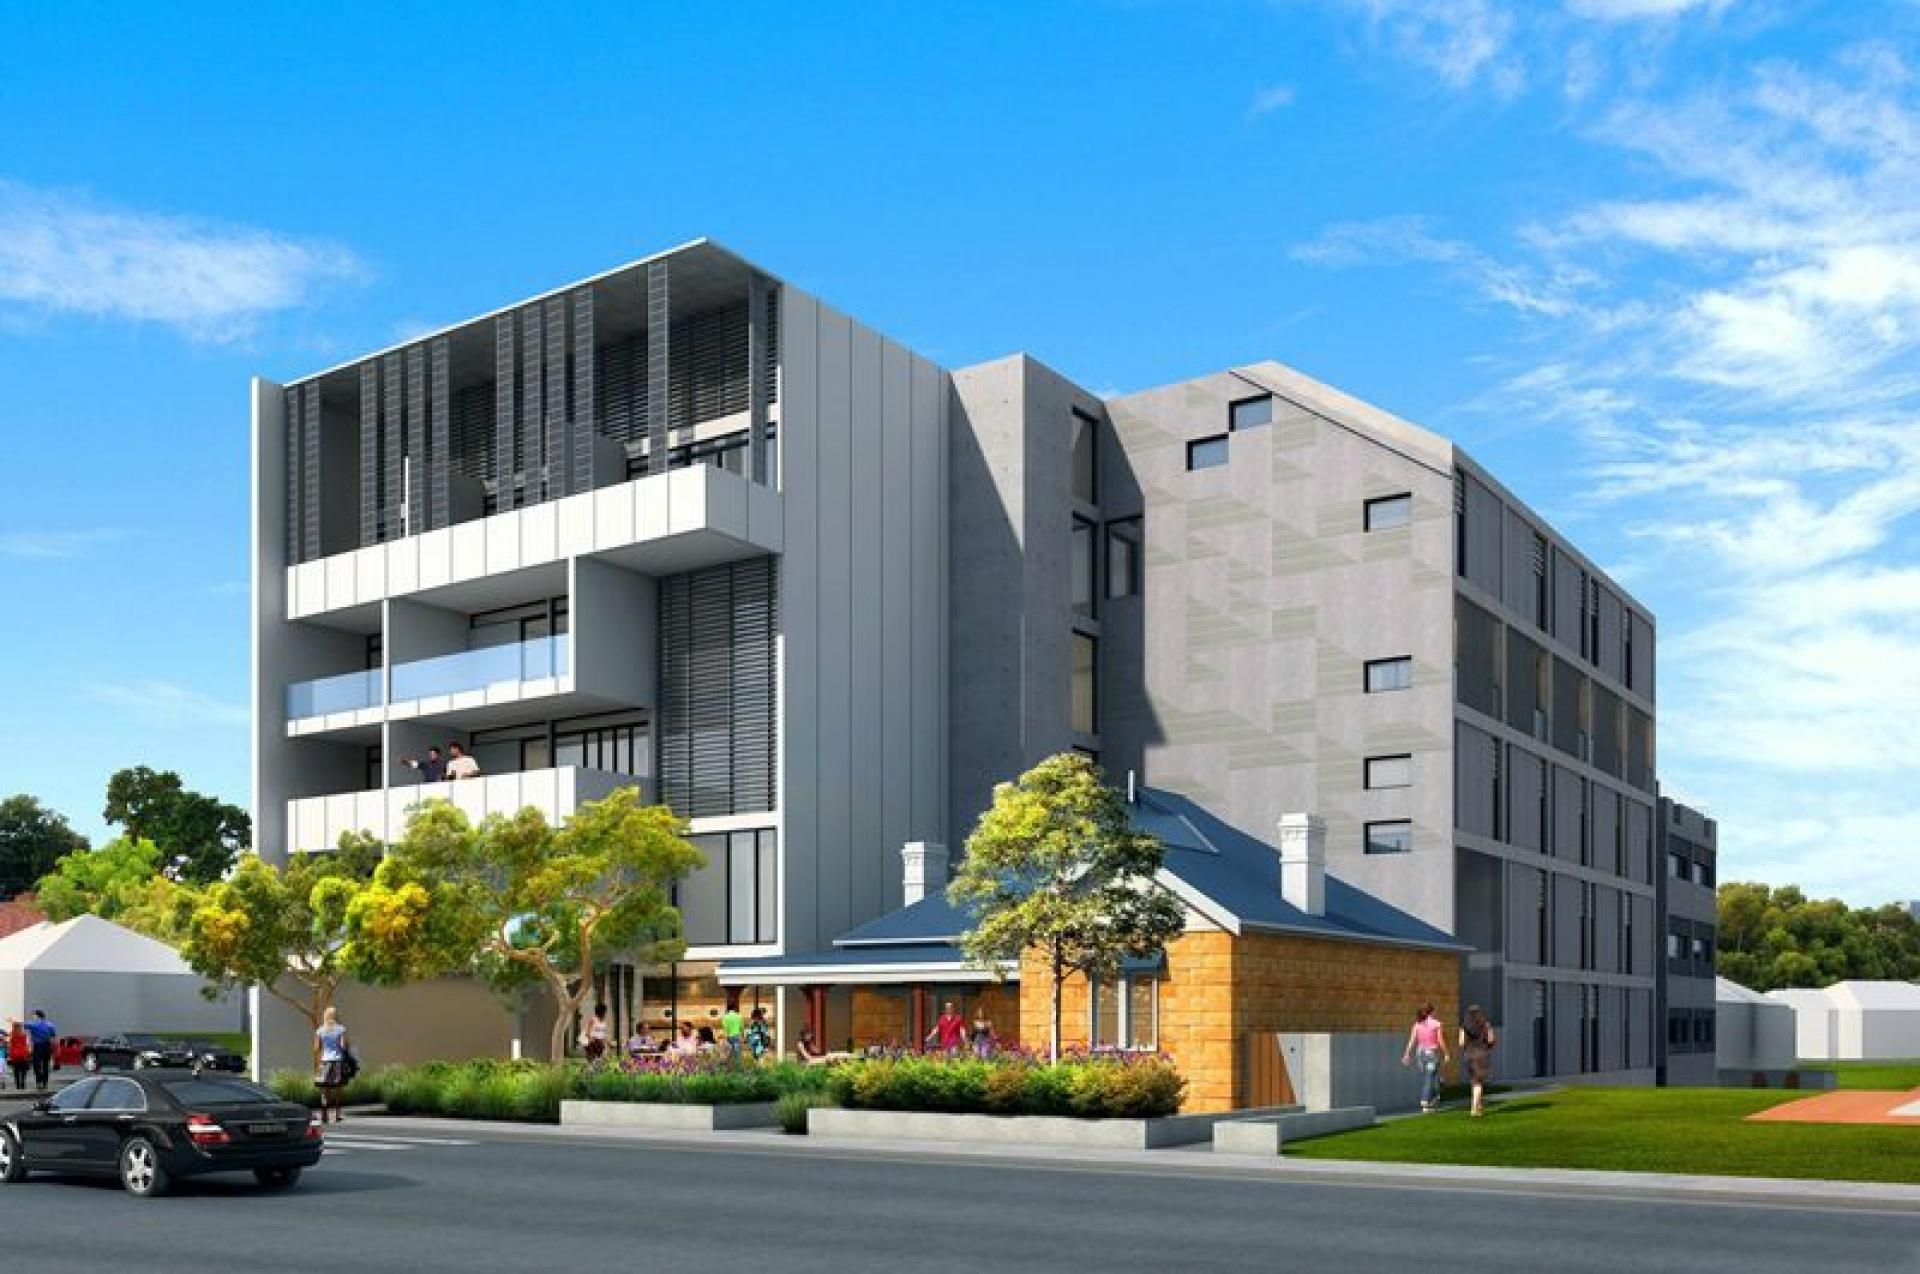 1 Bedrooms, Apartment, Leased, Old Northern Road, 1 Bathrooms, Listing ID 1341, Baulkham Hills, NSW, Australia,